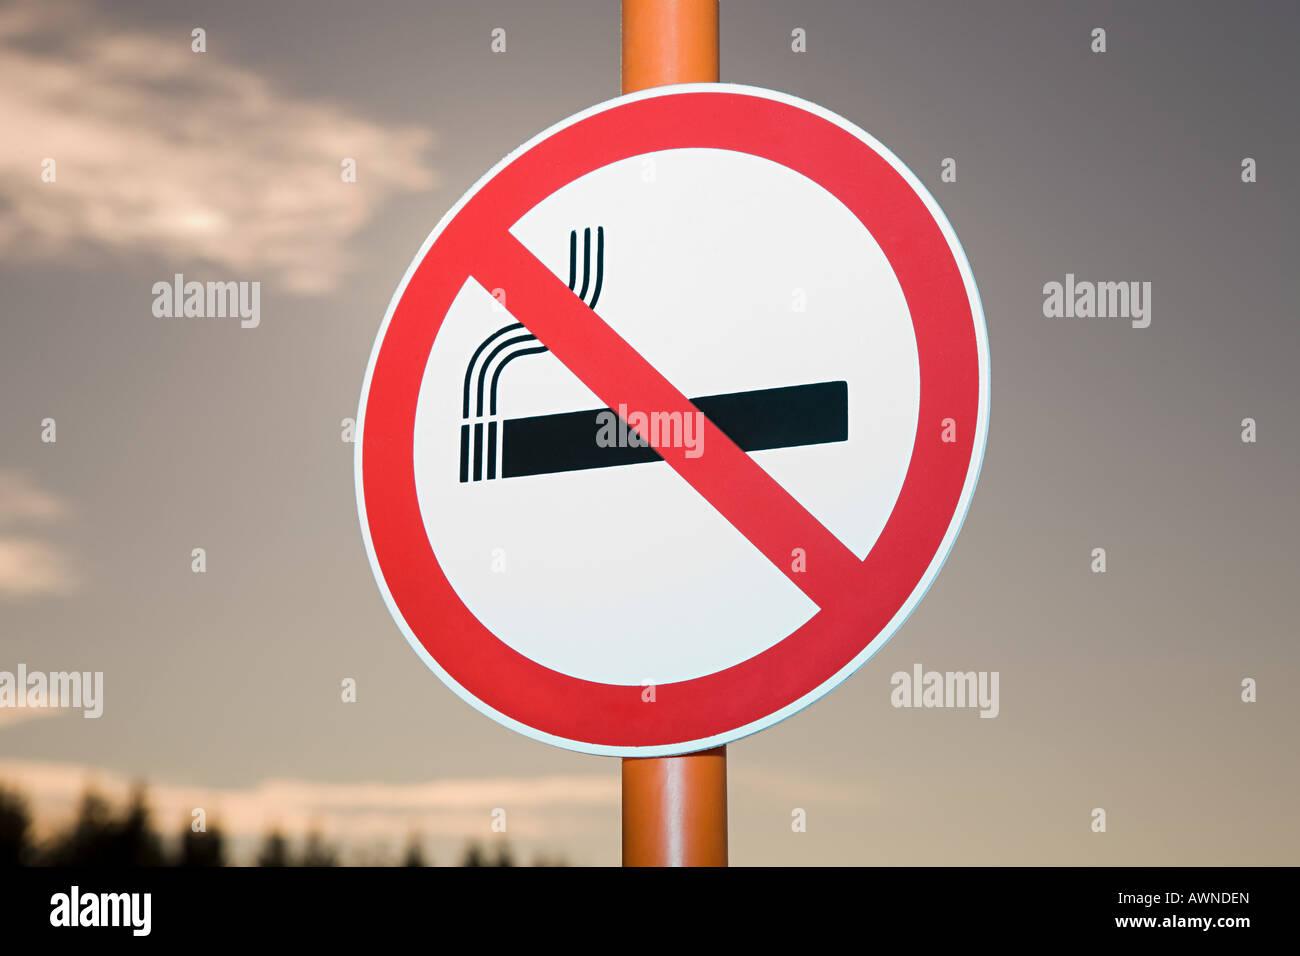 No smoking sign - Stock Image